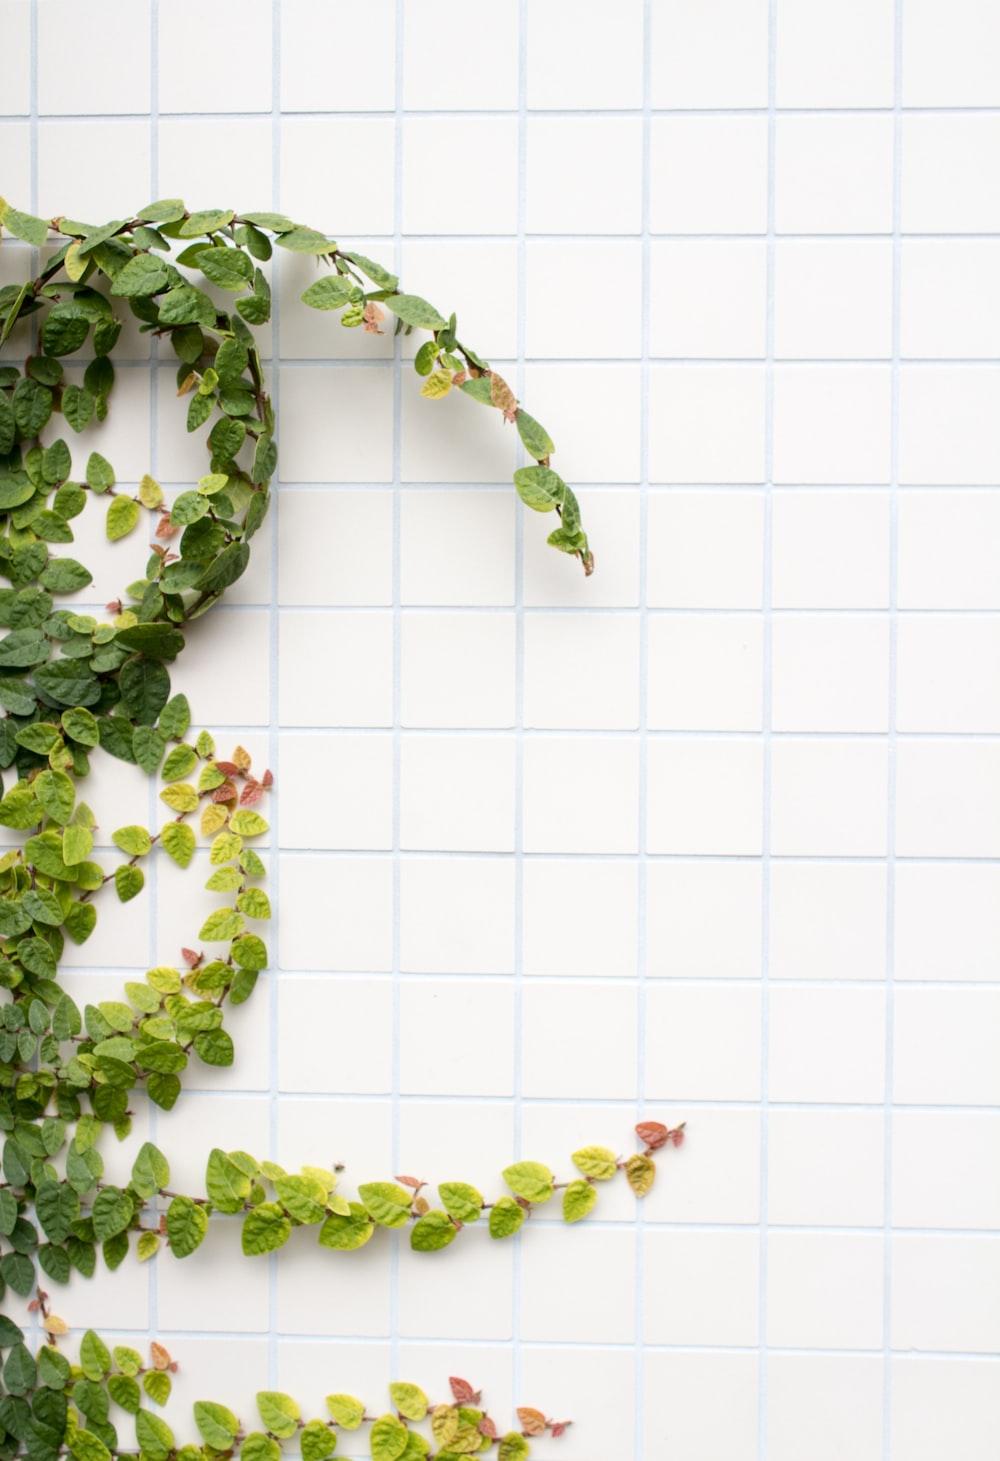 green leafed plant beside tiles